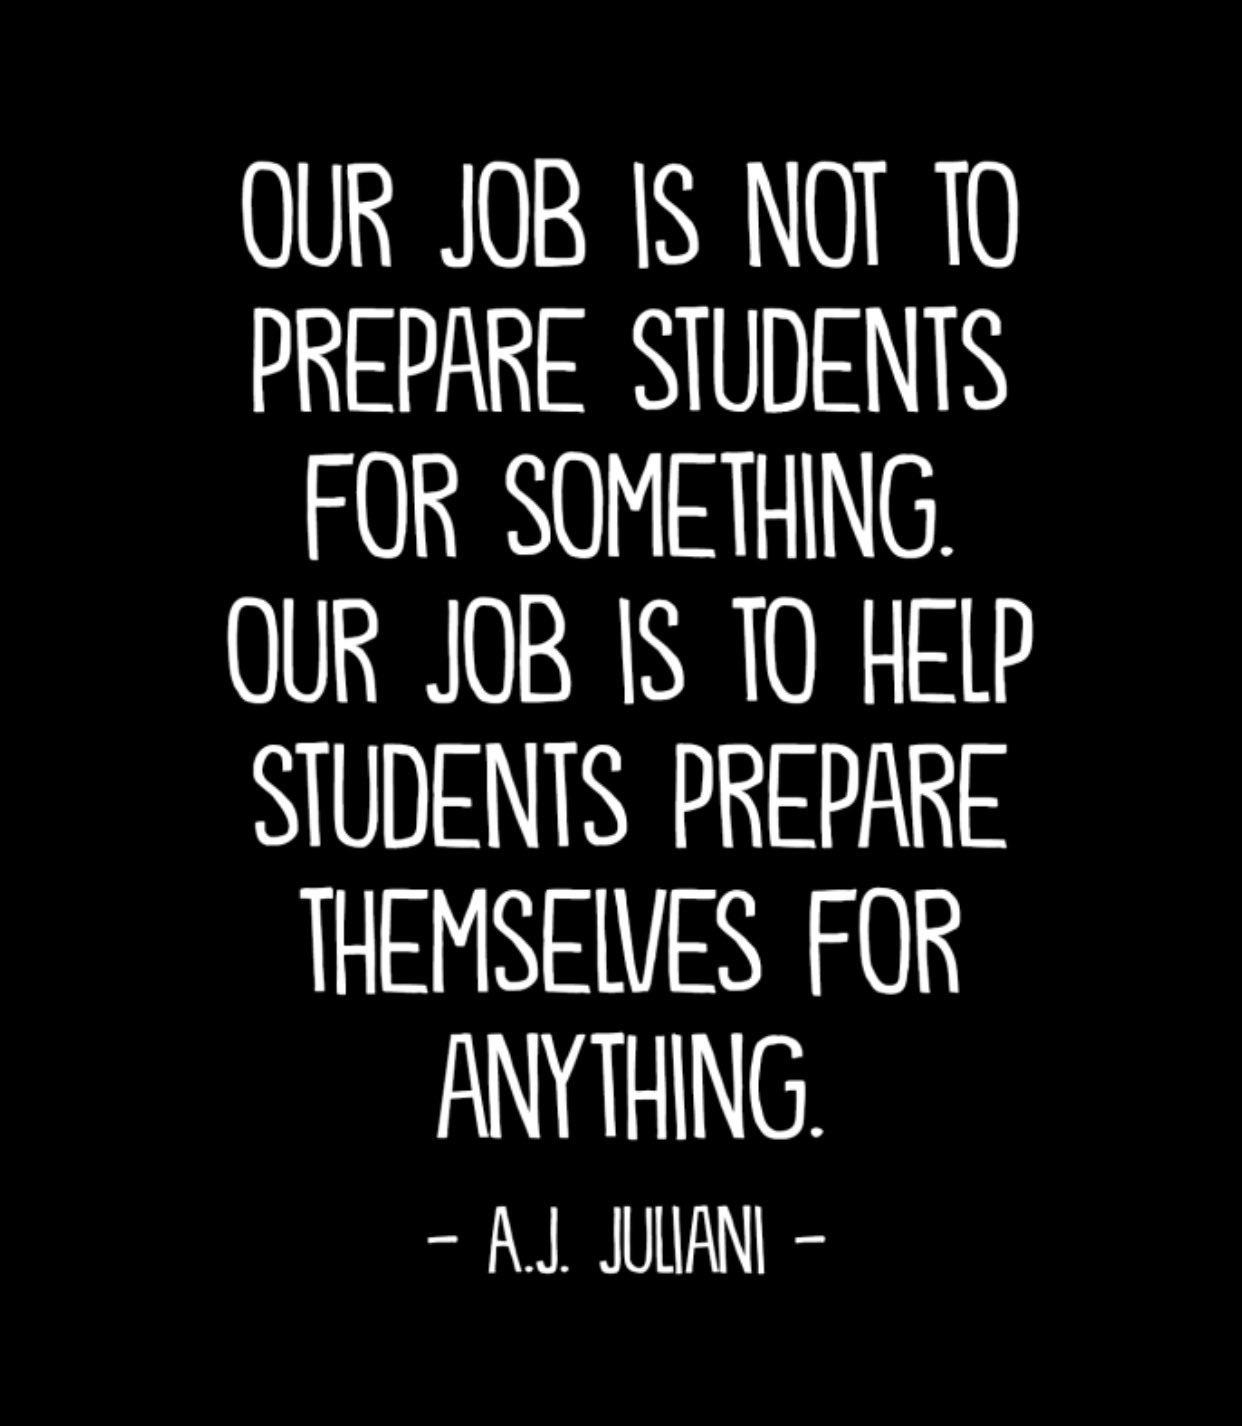 Preparing Students